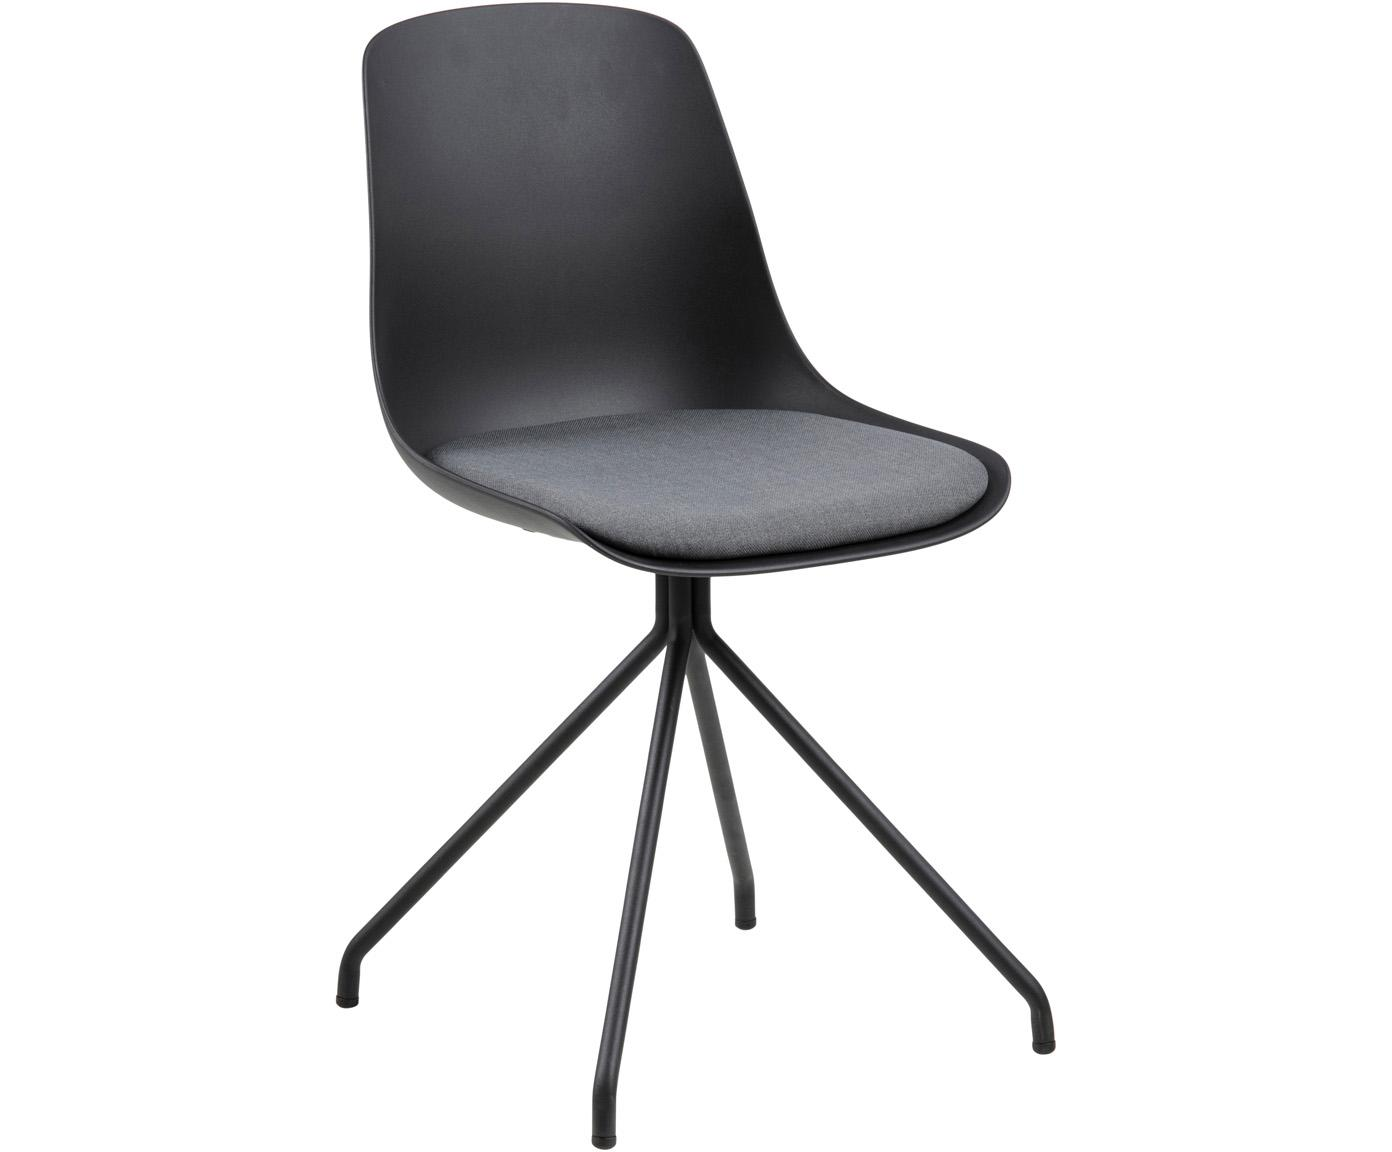 Sedia nera Eva, Gambe: metallo rivestito, Seduta: materiale sintetico, Nero, Larg. 51 x Prof. 85 cm